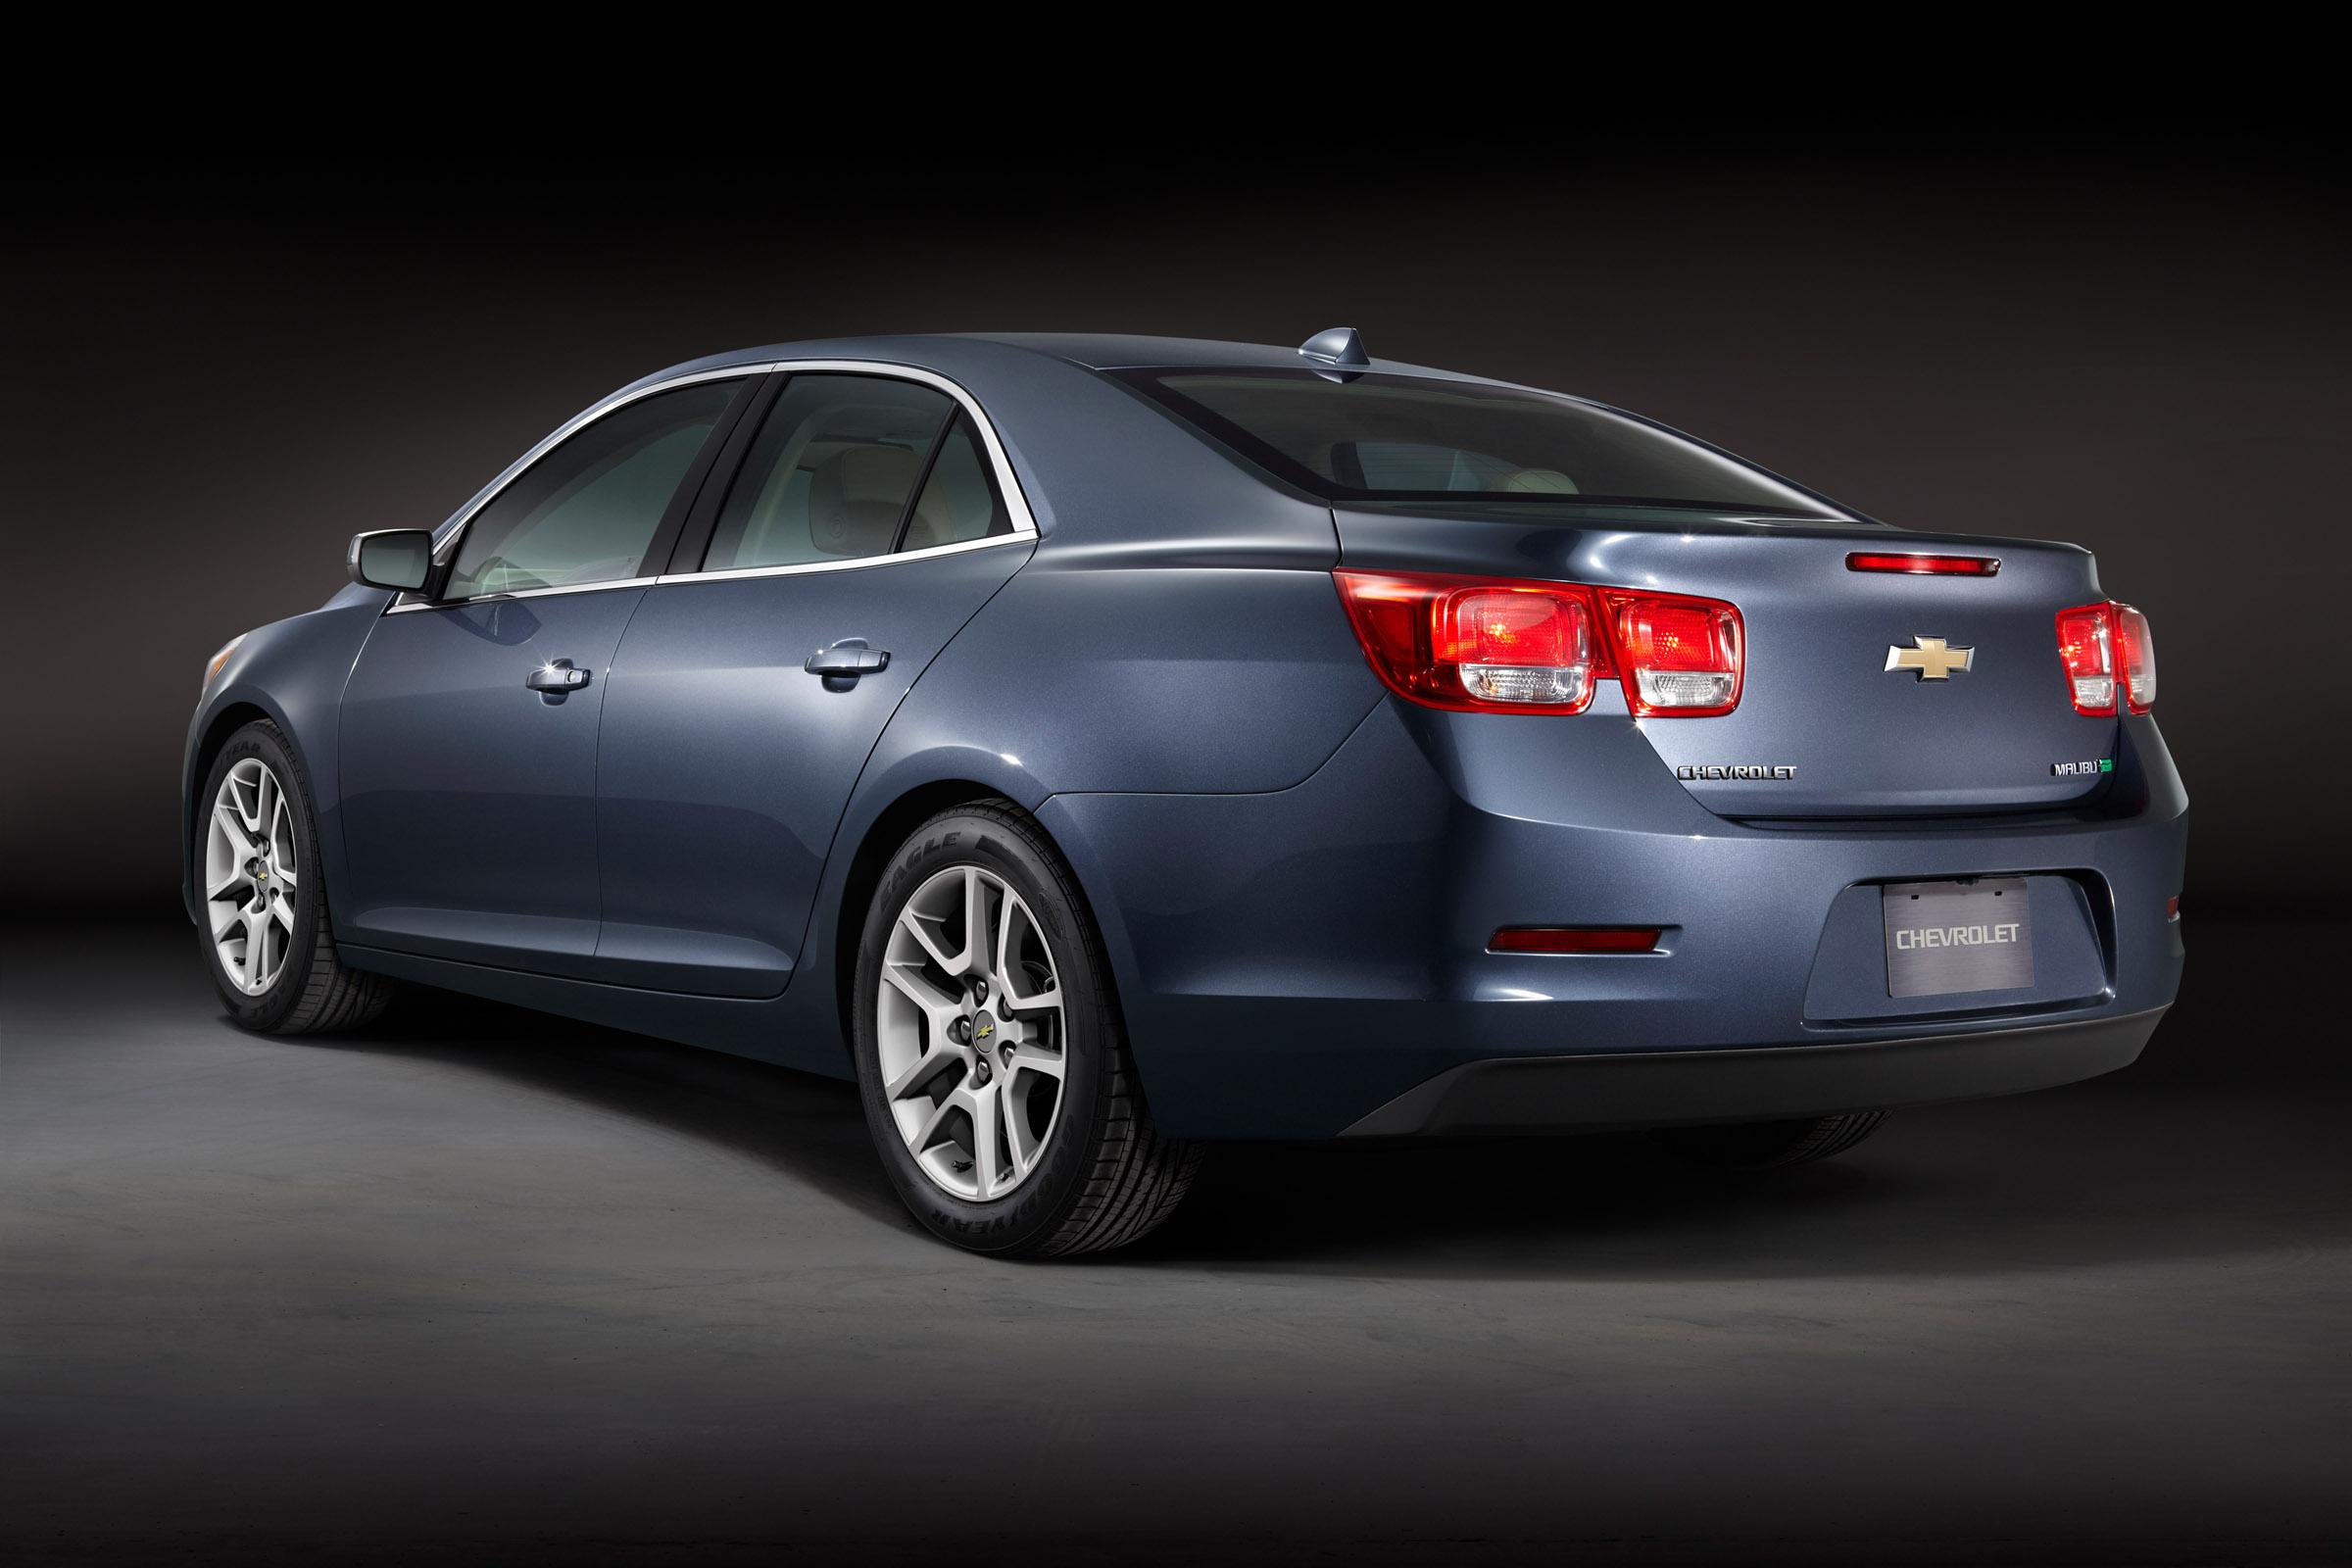 2013 Chevrolet Malibu Eco Priced Under $26,000